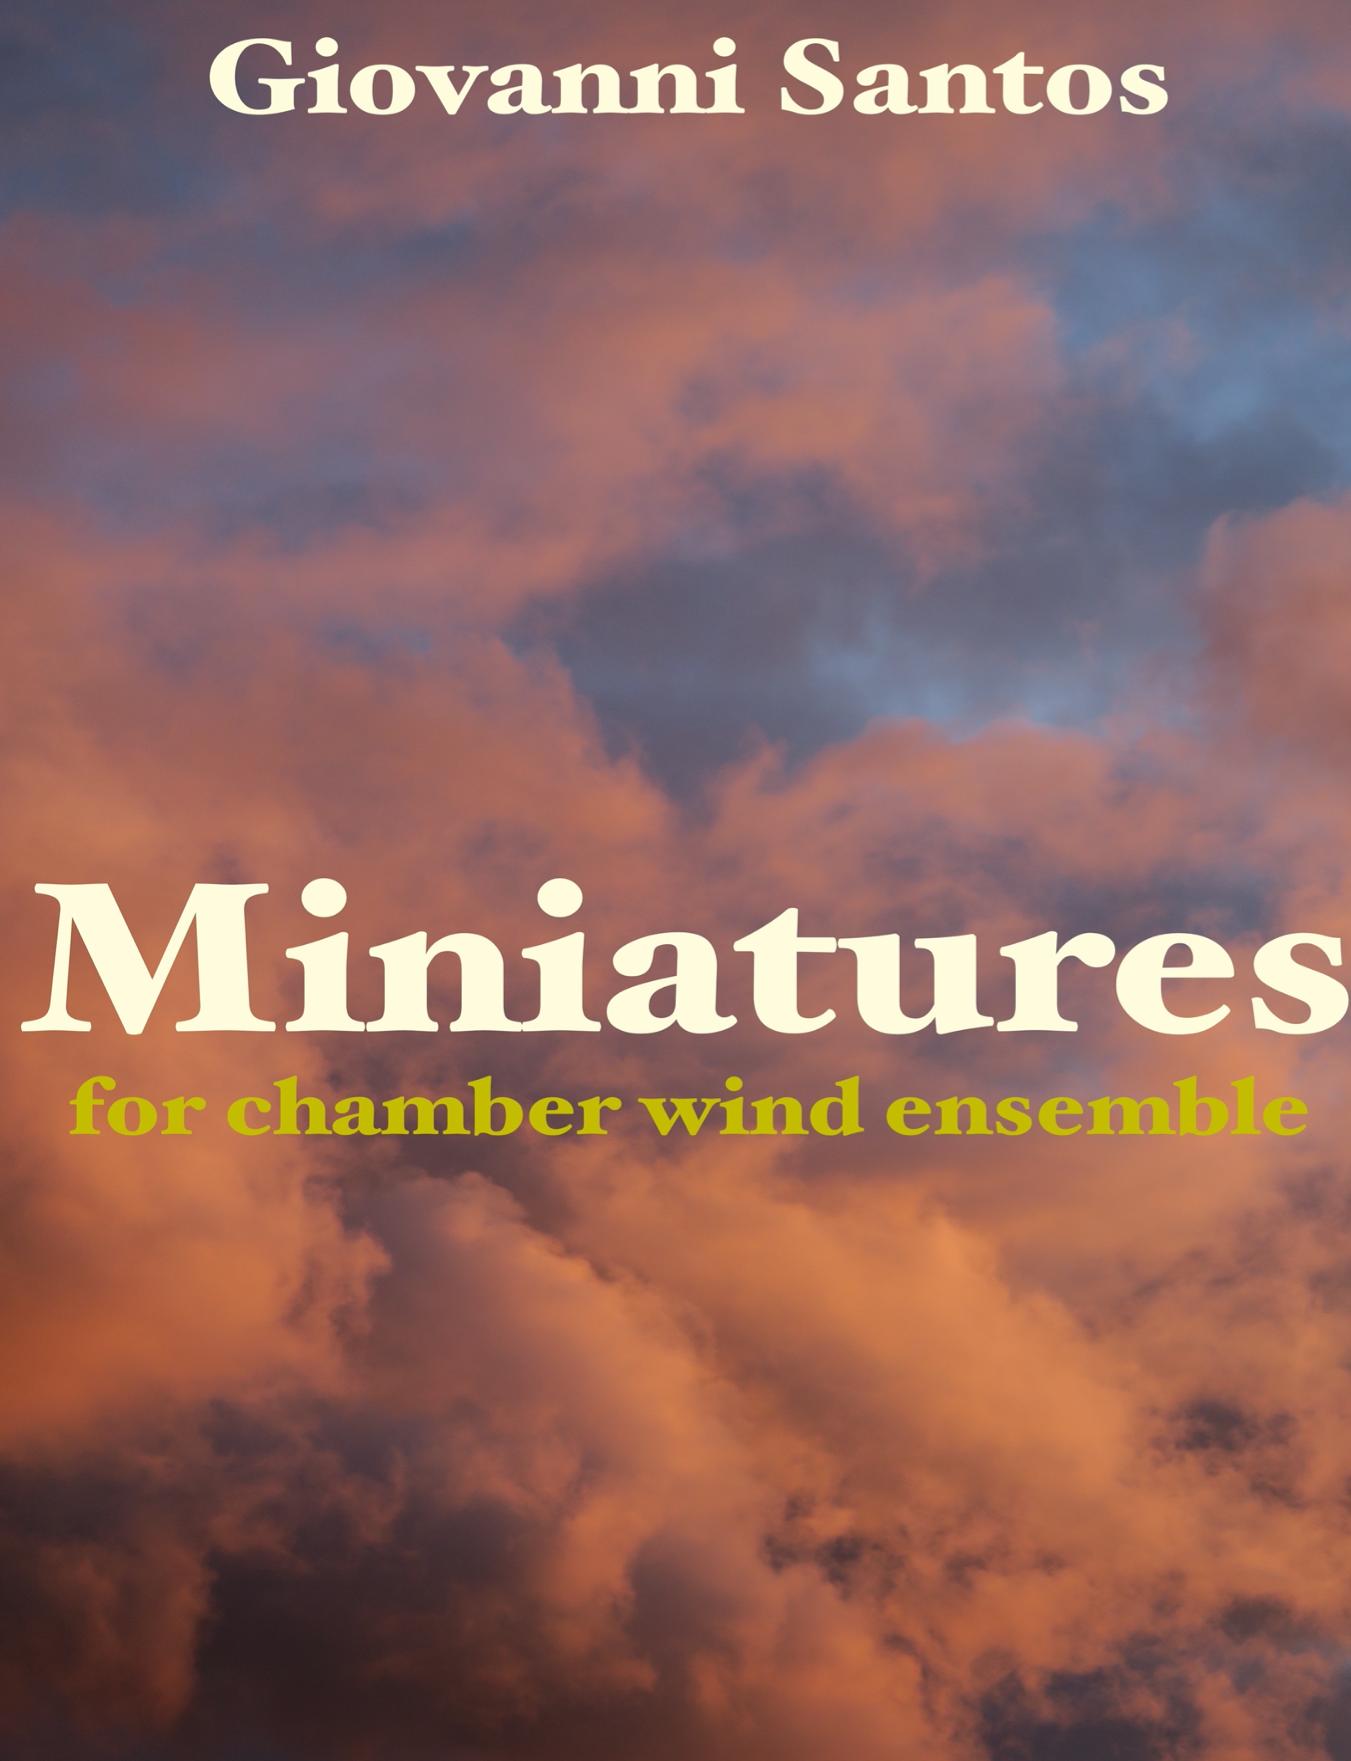 Miniatures by Giovanni Santos